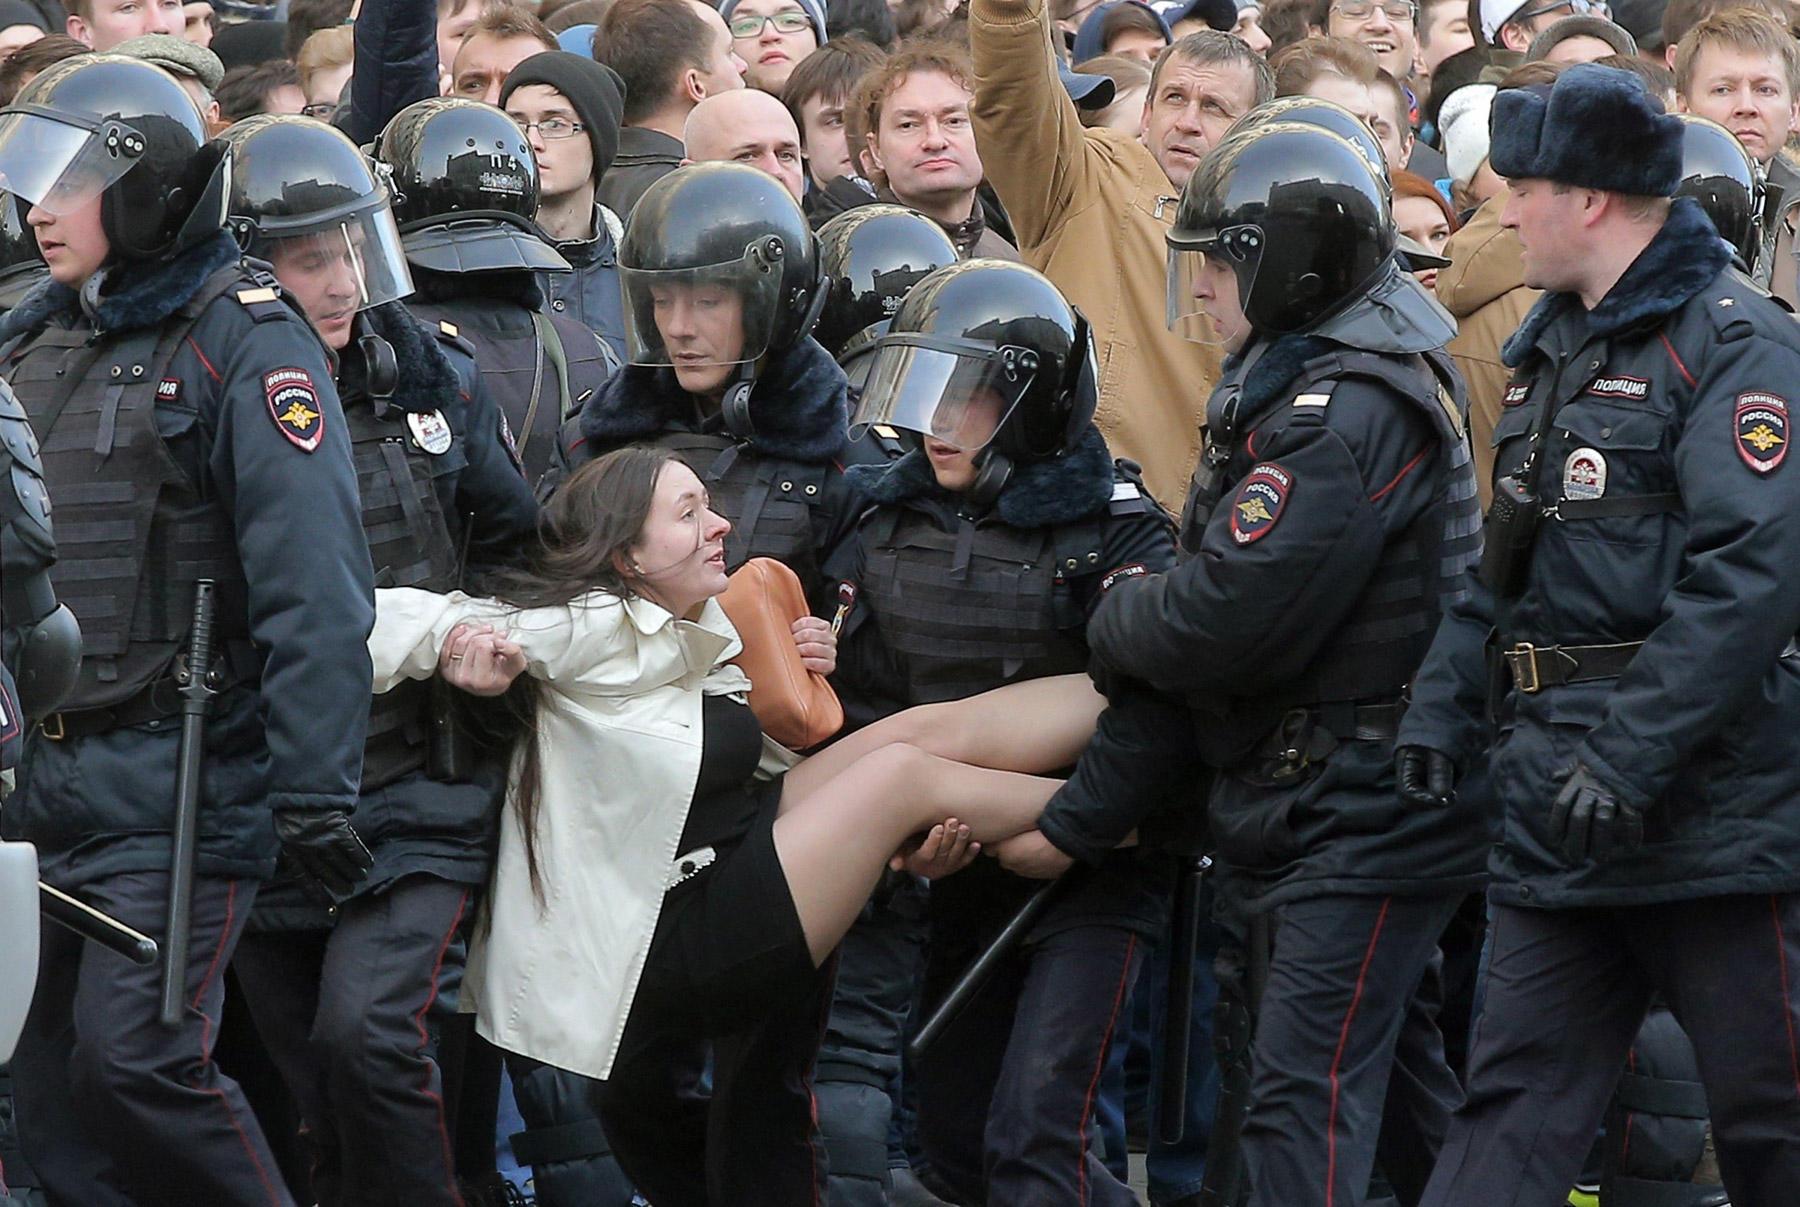 «Полиция проявила себя безукоризненно».